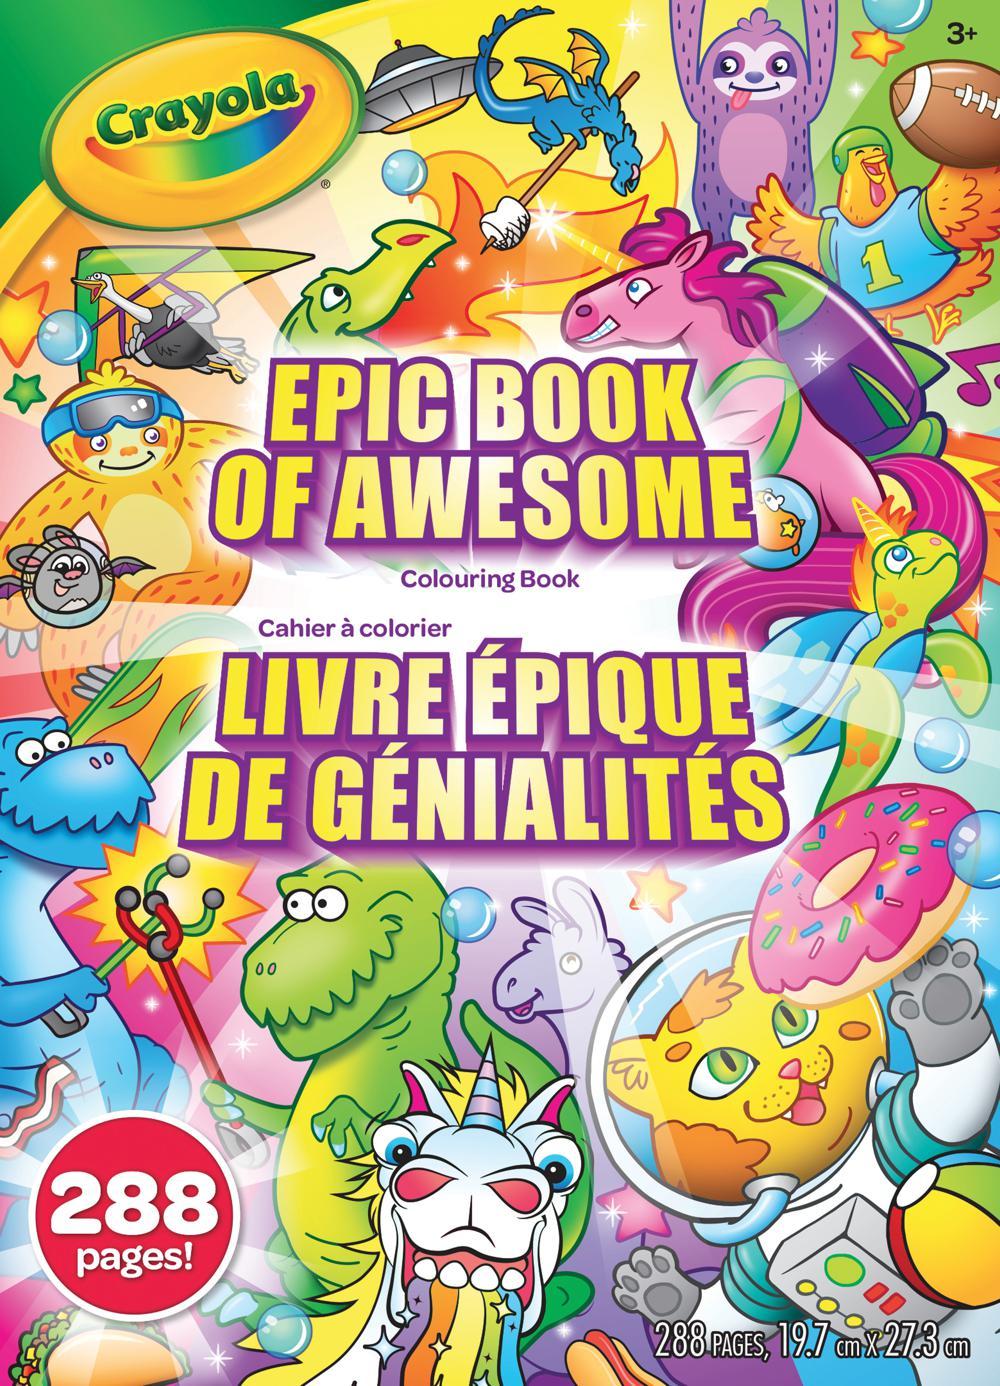 Crayola - Cahiers à colorier 288 pages assortis